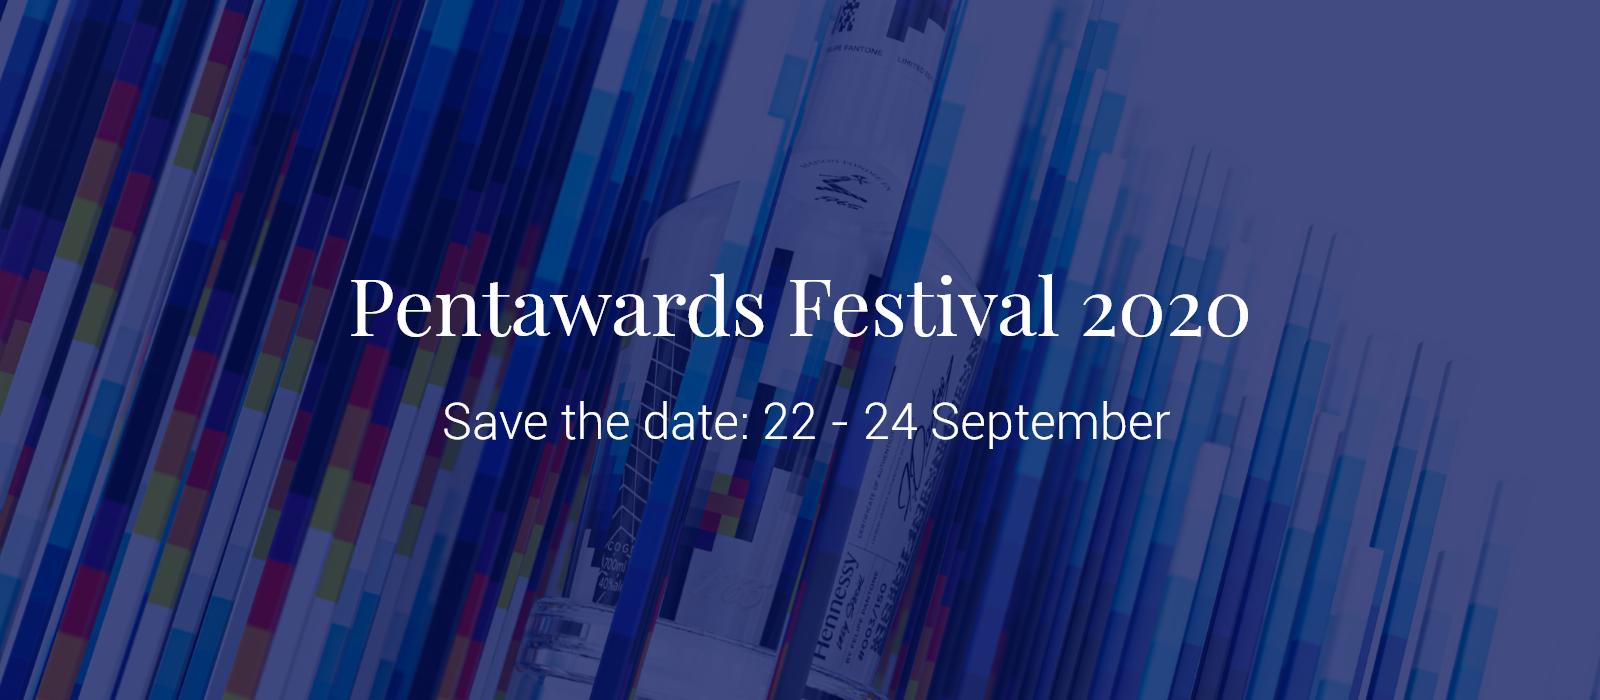 Pentawards Festival 2020